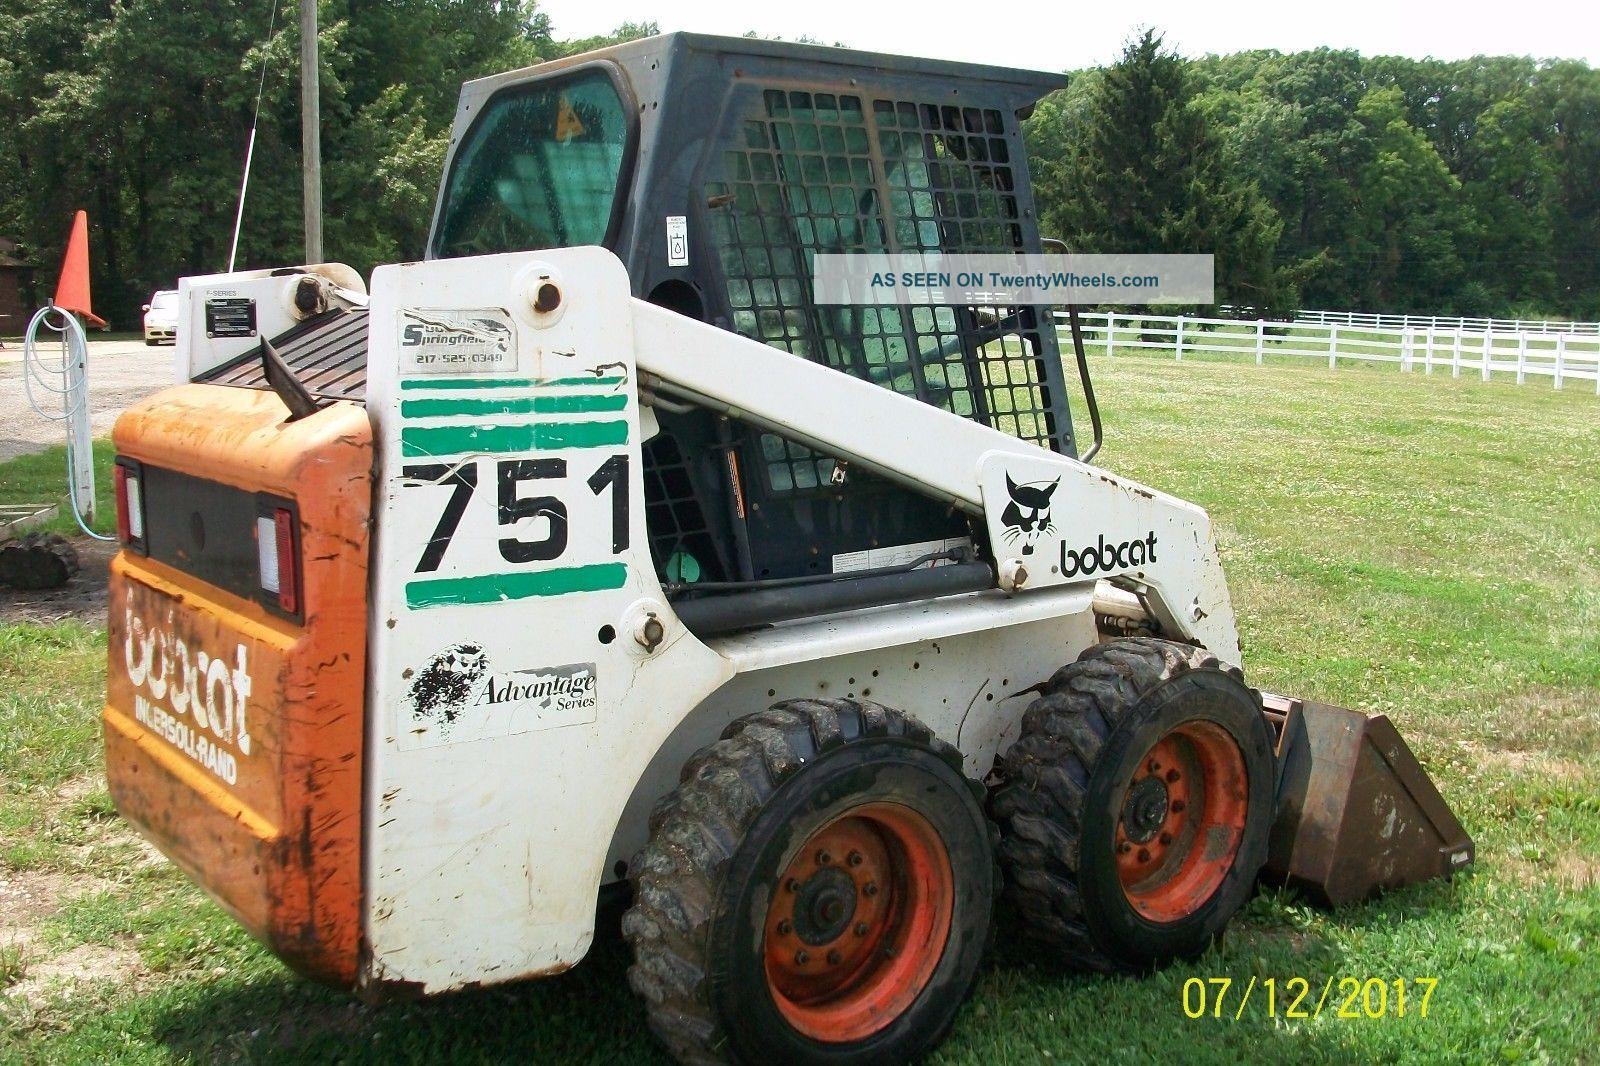 Bobcat 751 Loader / 60 Inch Smooth Bucket Skid Steer Loaders photo